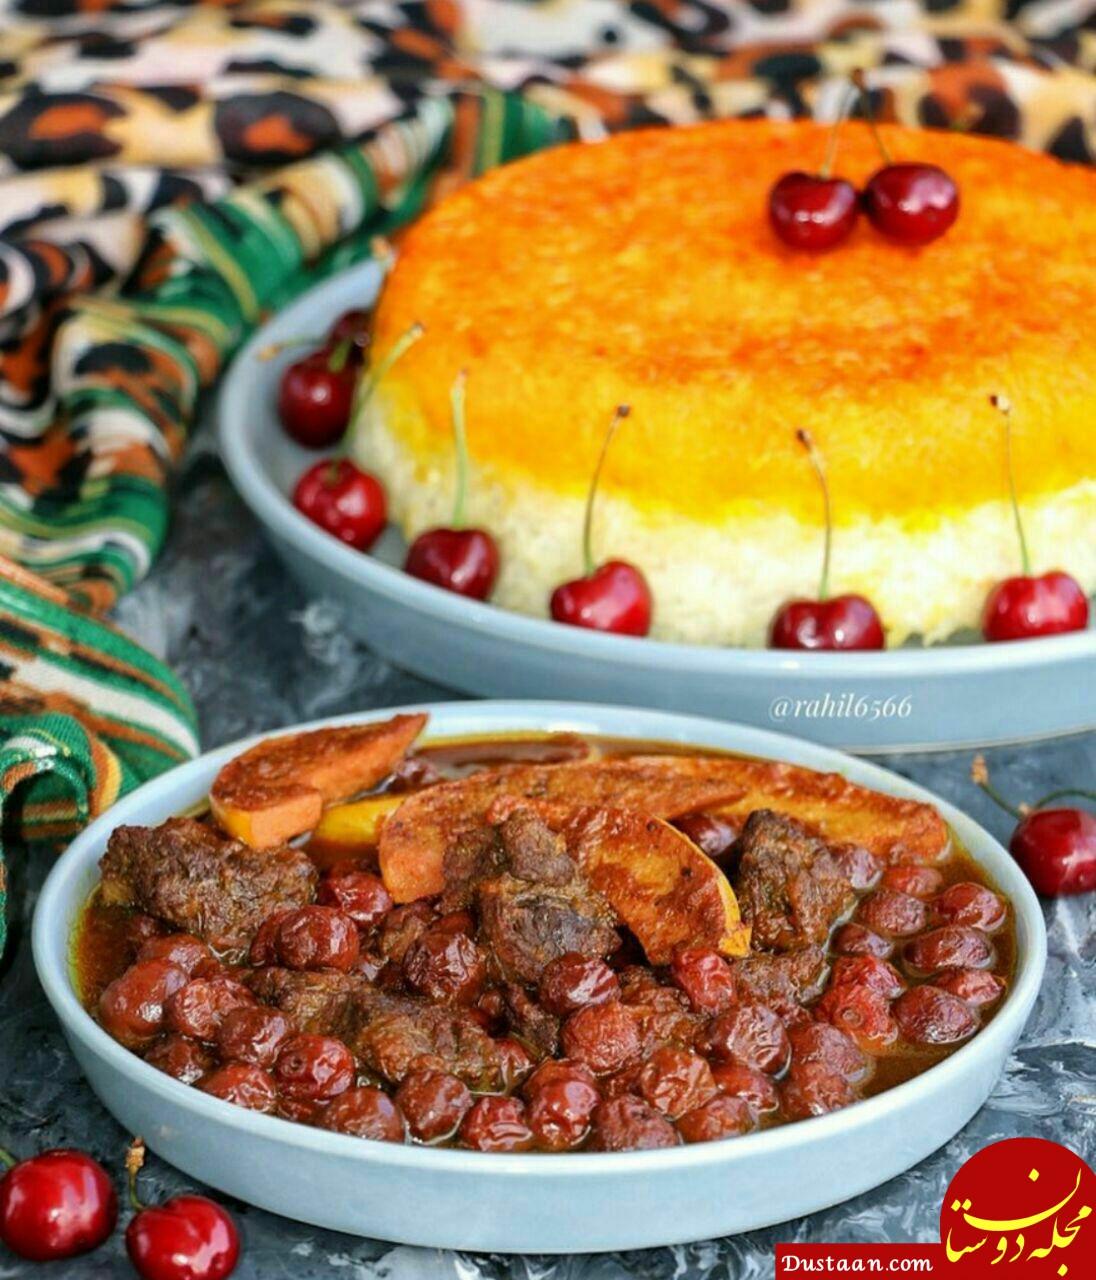 www.dustaan.com طرز تهیه خورش سیب آلبالو به سبکی خوشمزه و متفاوت